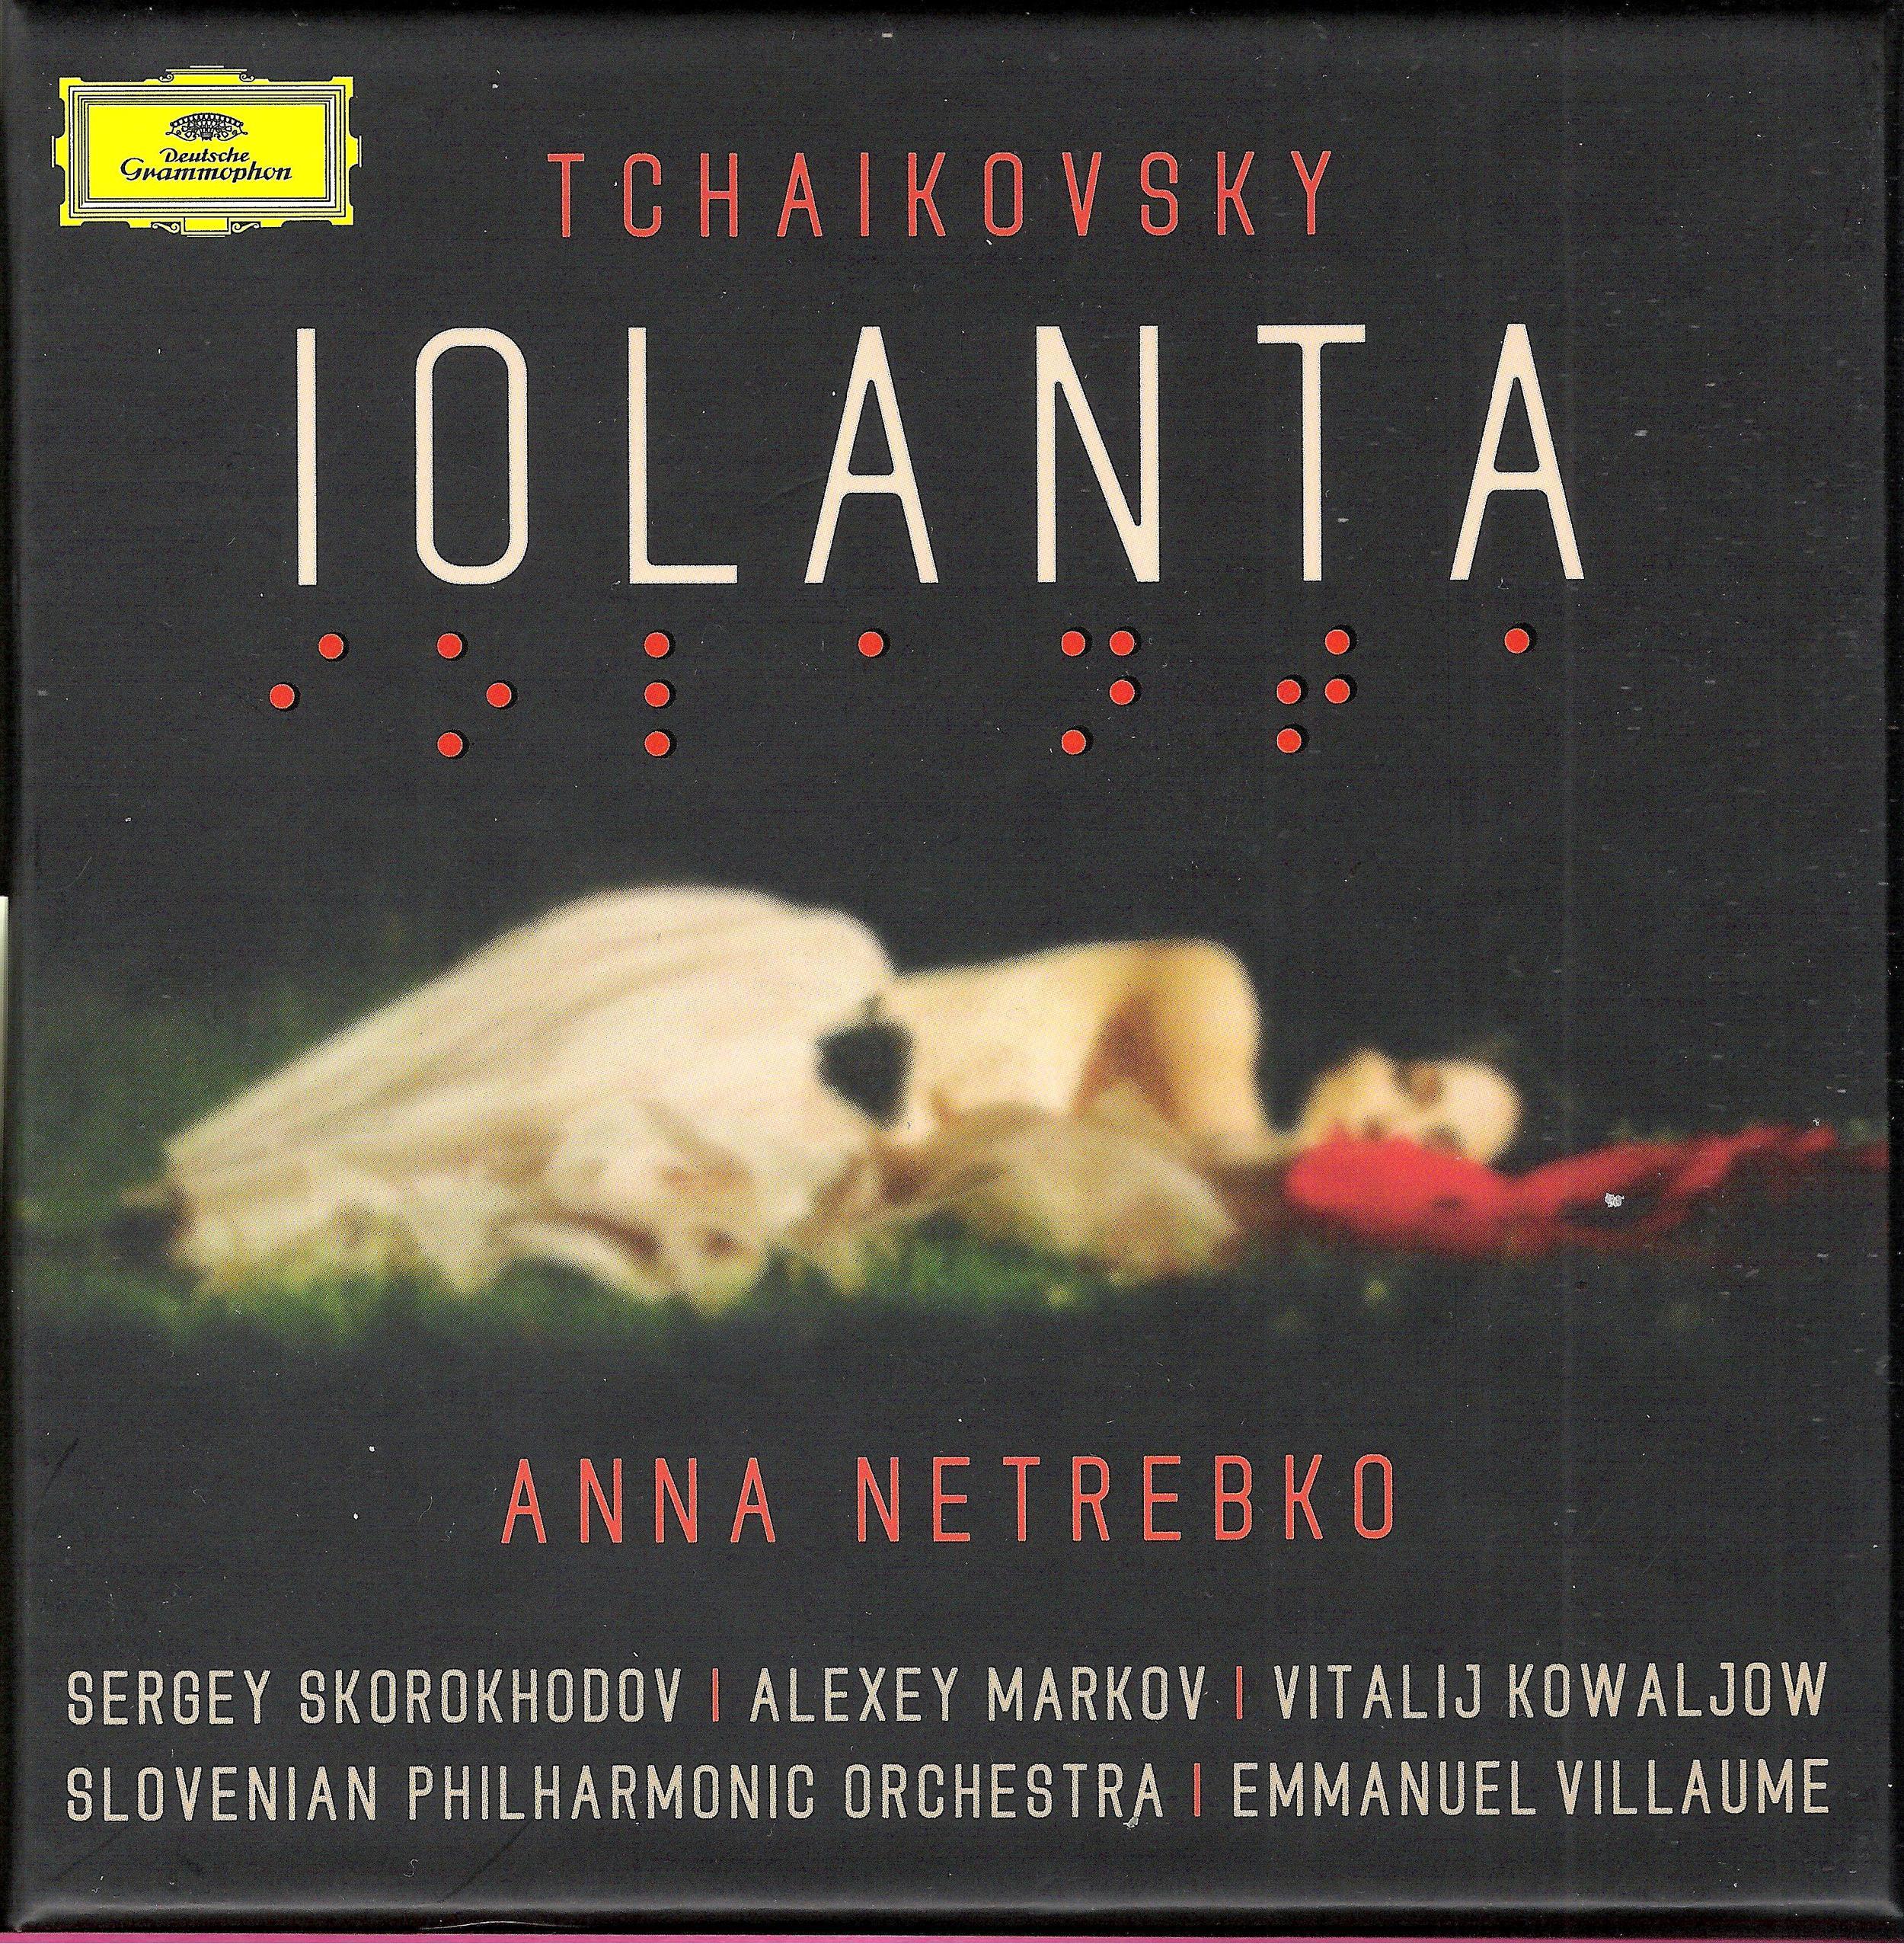 Anna Netrebko stars in Tchaikovsky's  Iolanta  under Emmanuel Villaume